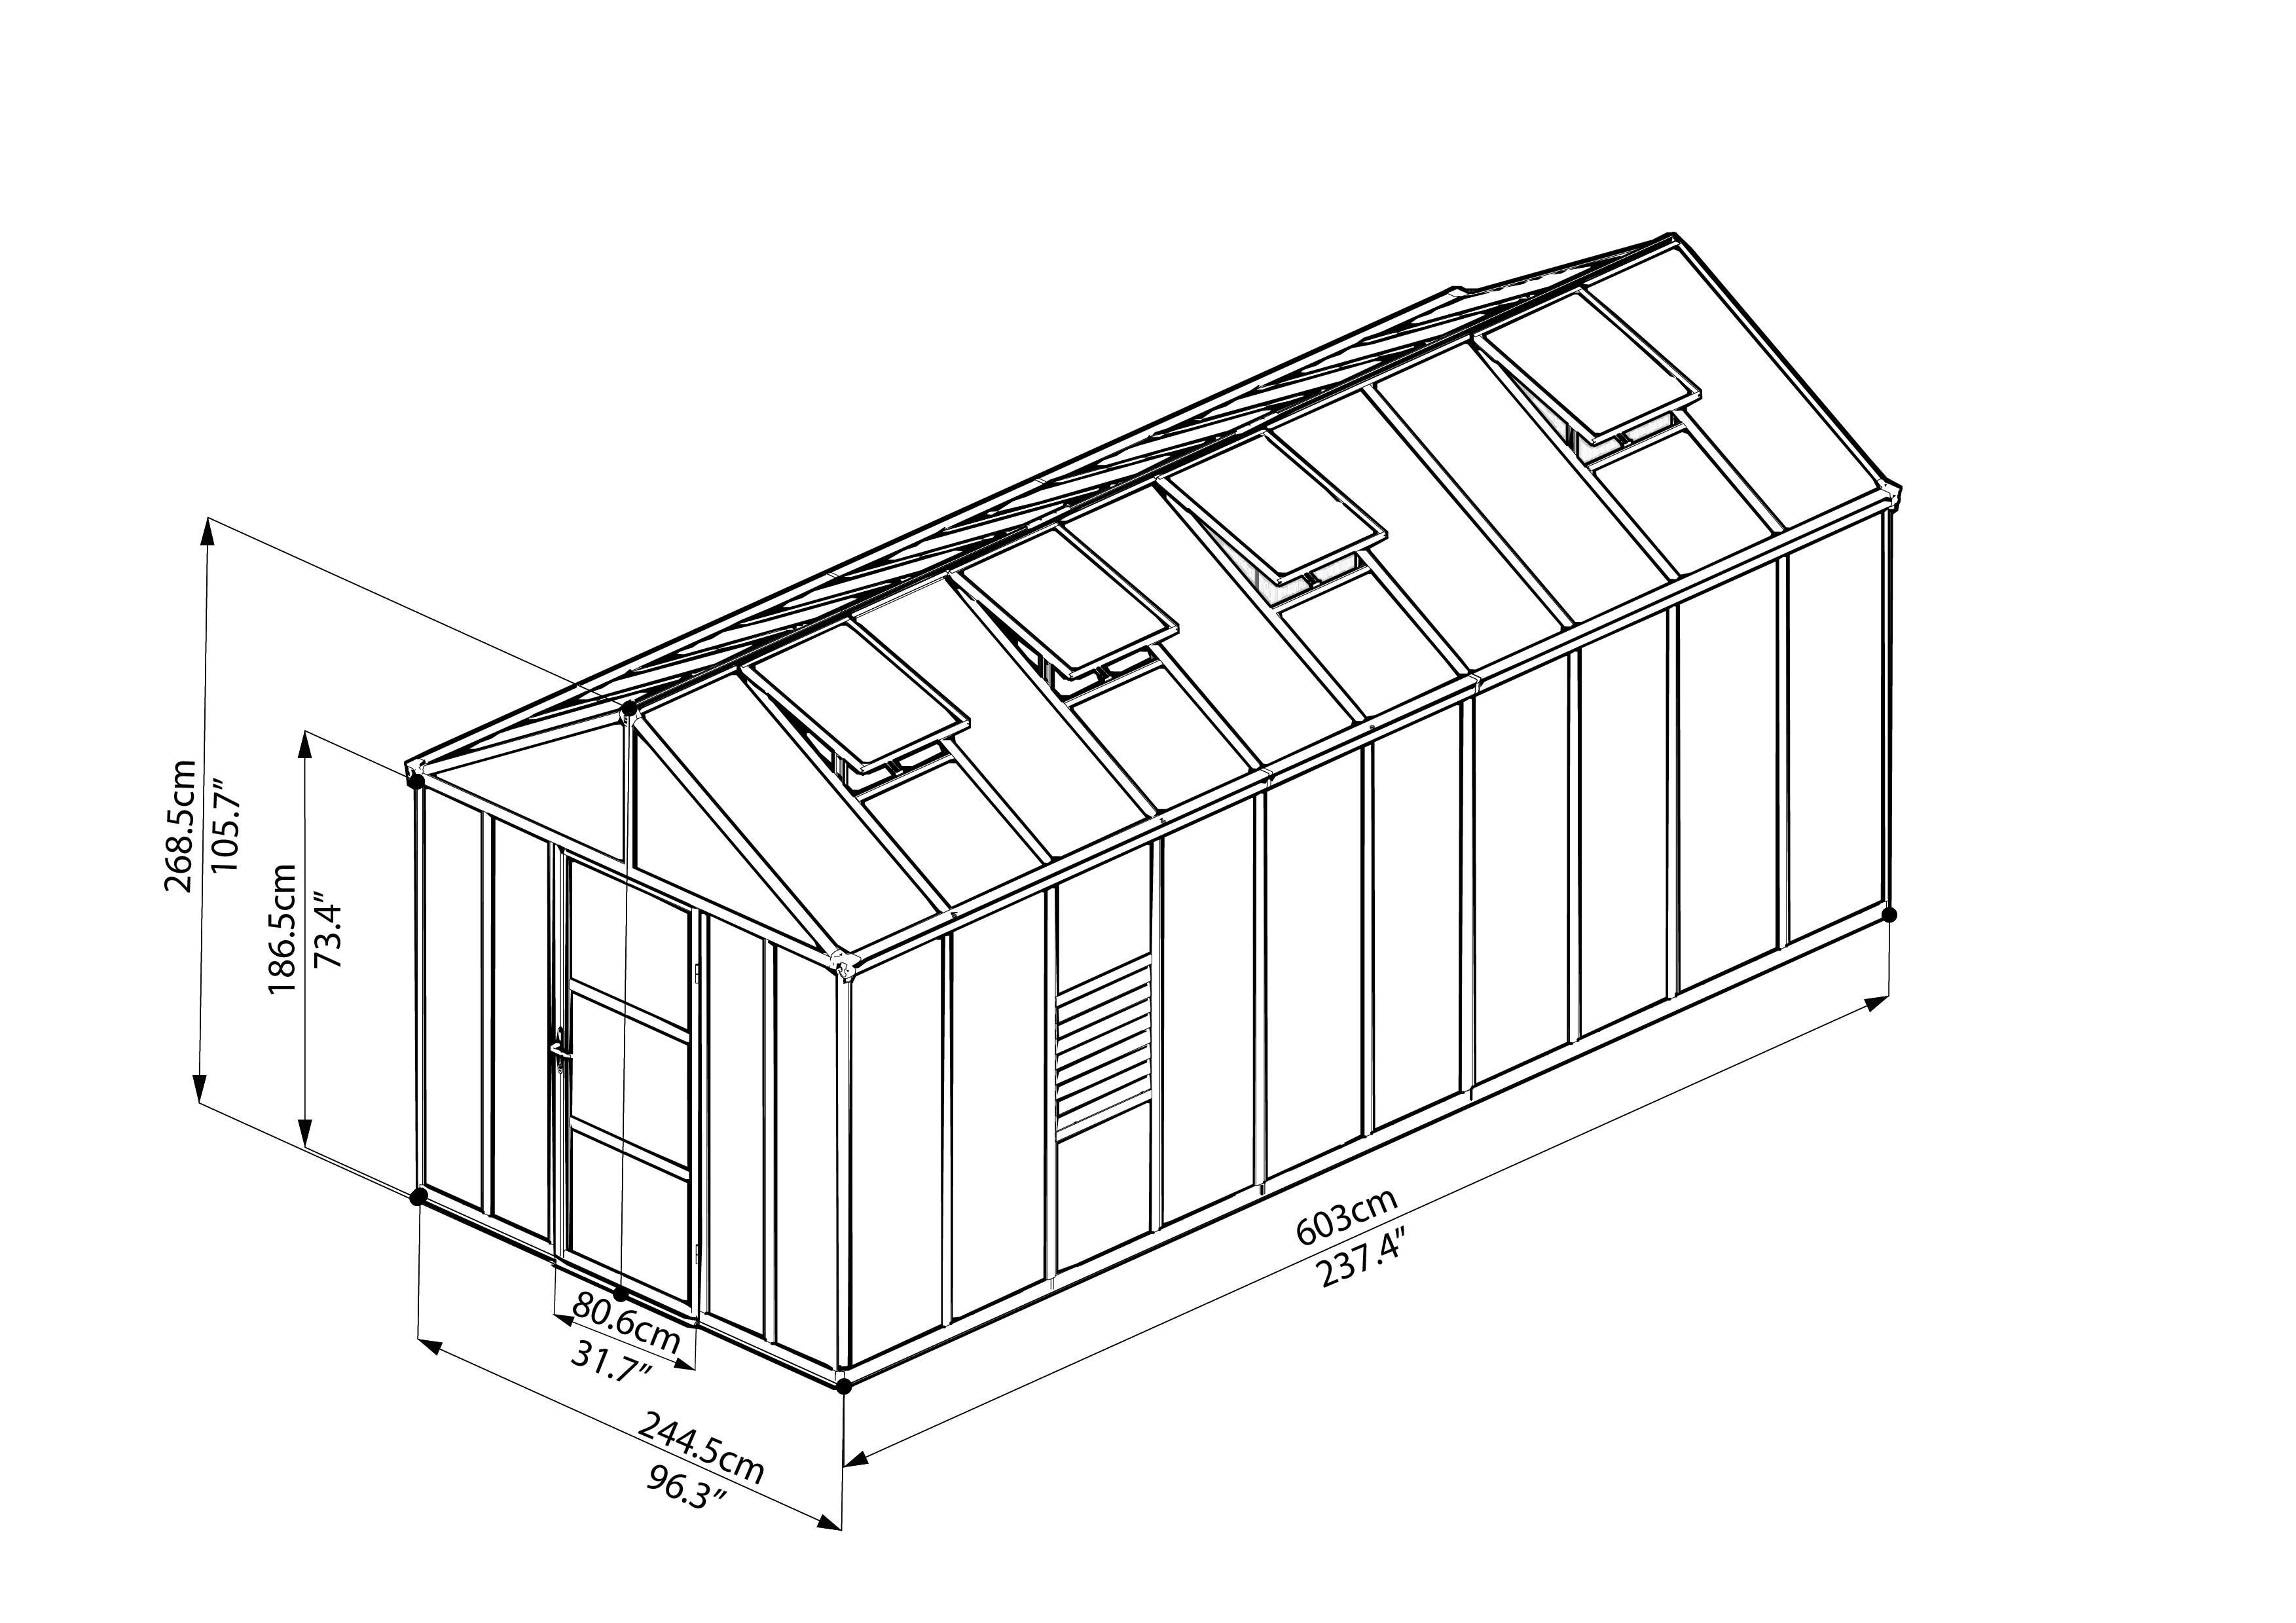 palram-greenhouses-glory-8x20-drawing-isoview.jpg